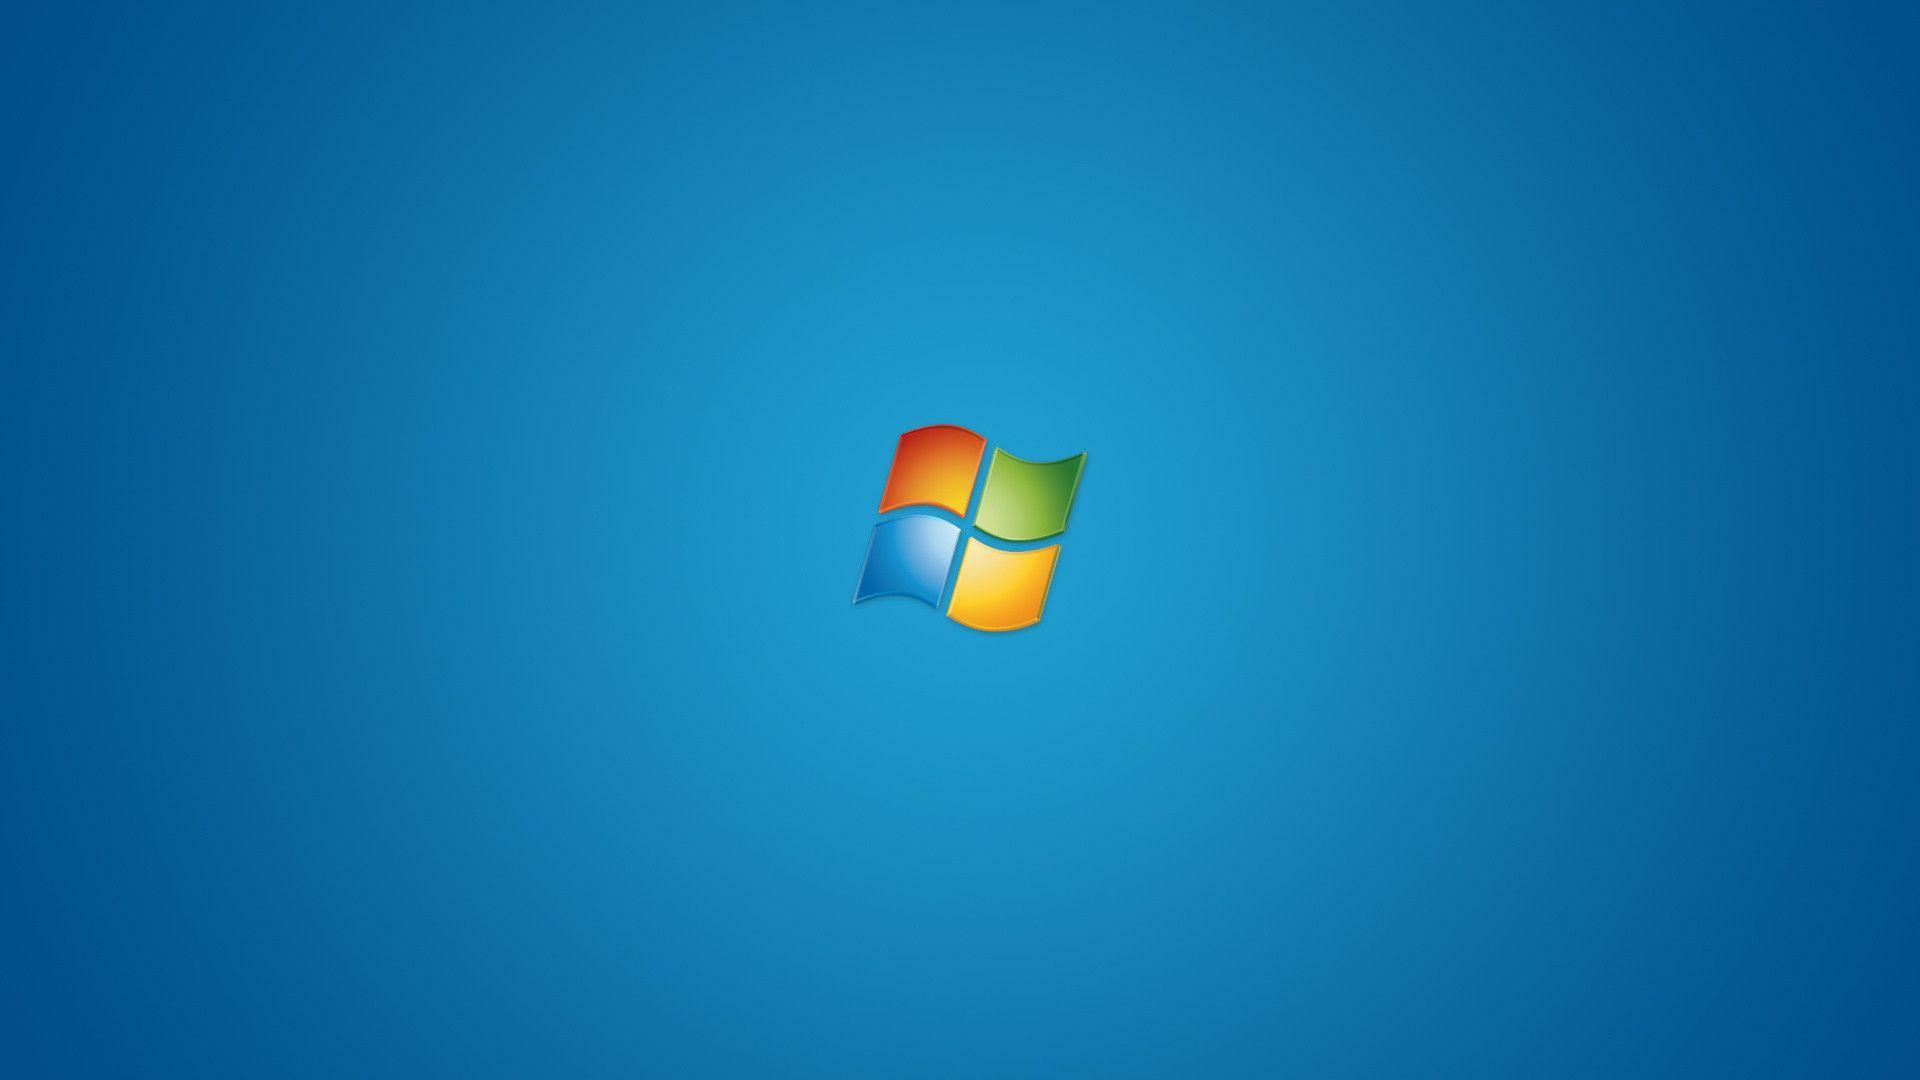 Microsoft Windows 7 Backgrounds